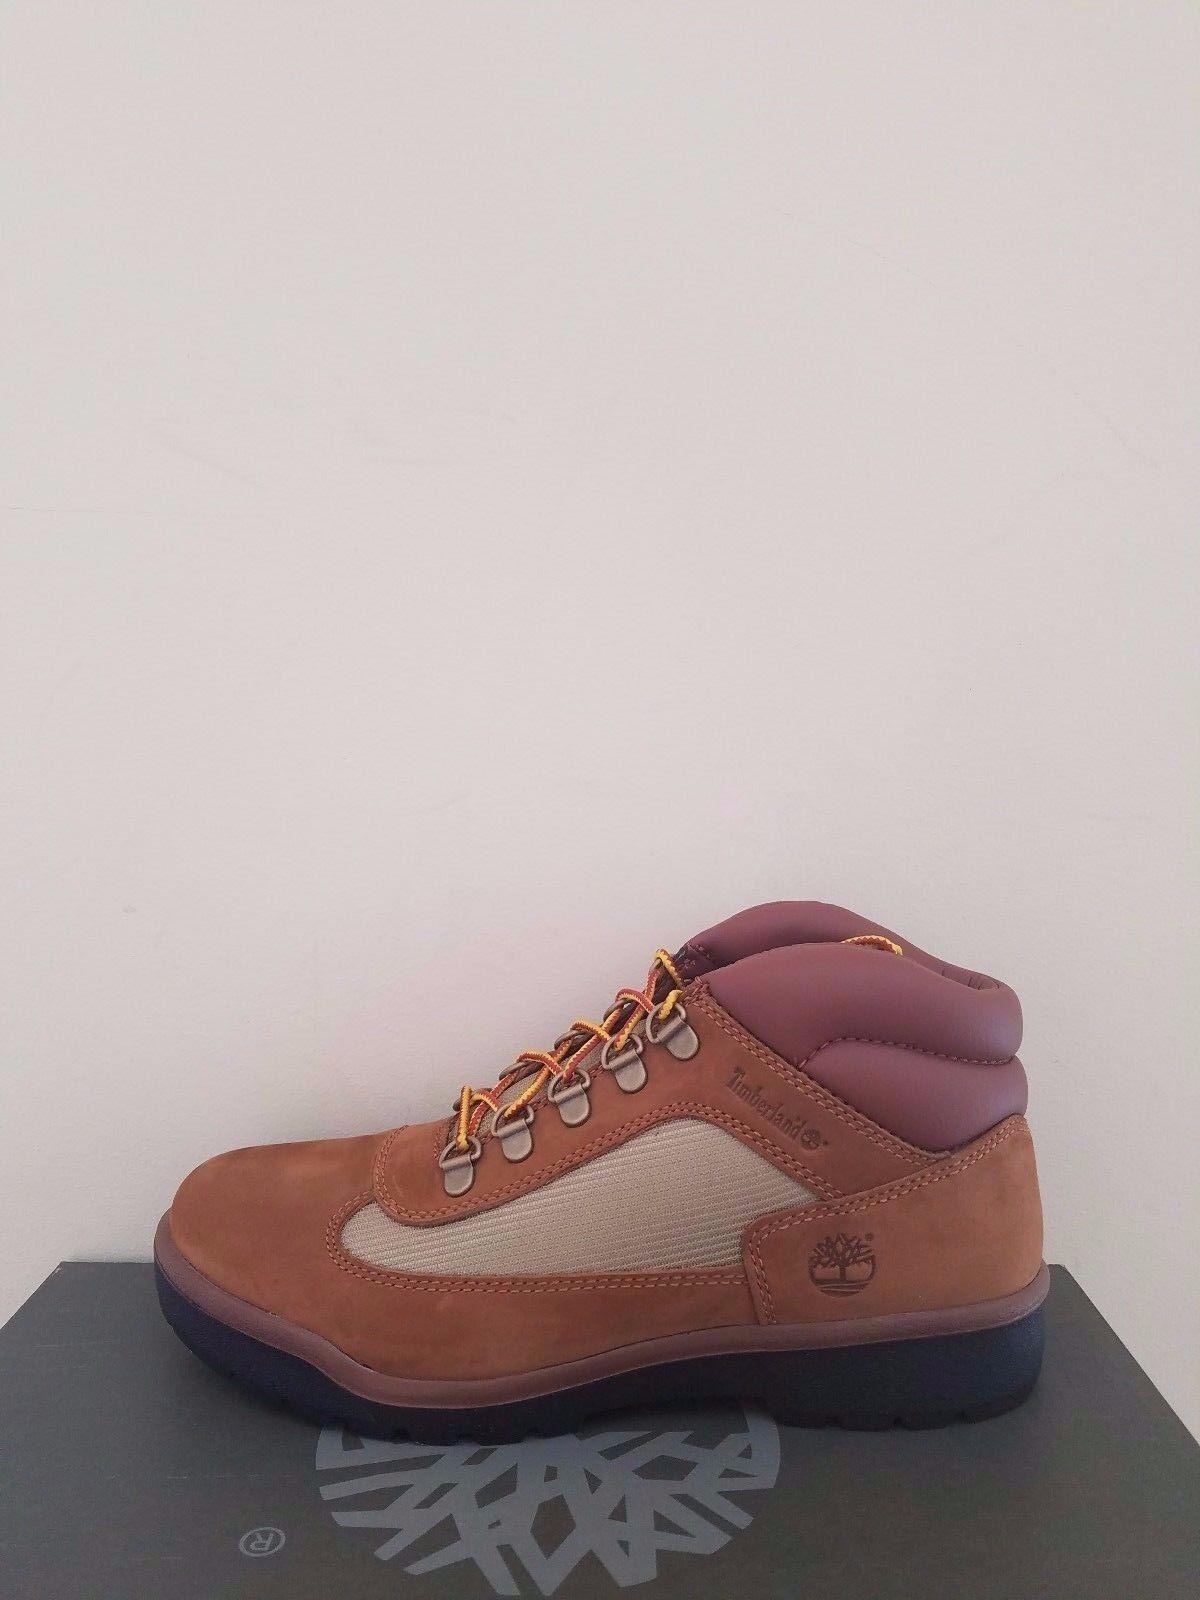 Timberland Women's Field  Boots NIB